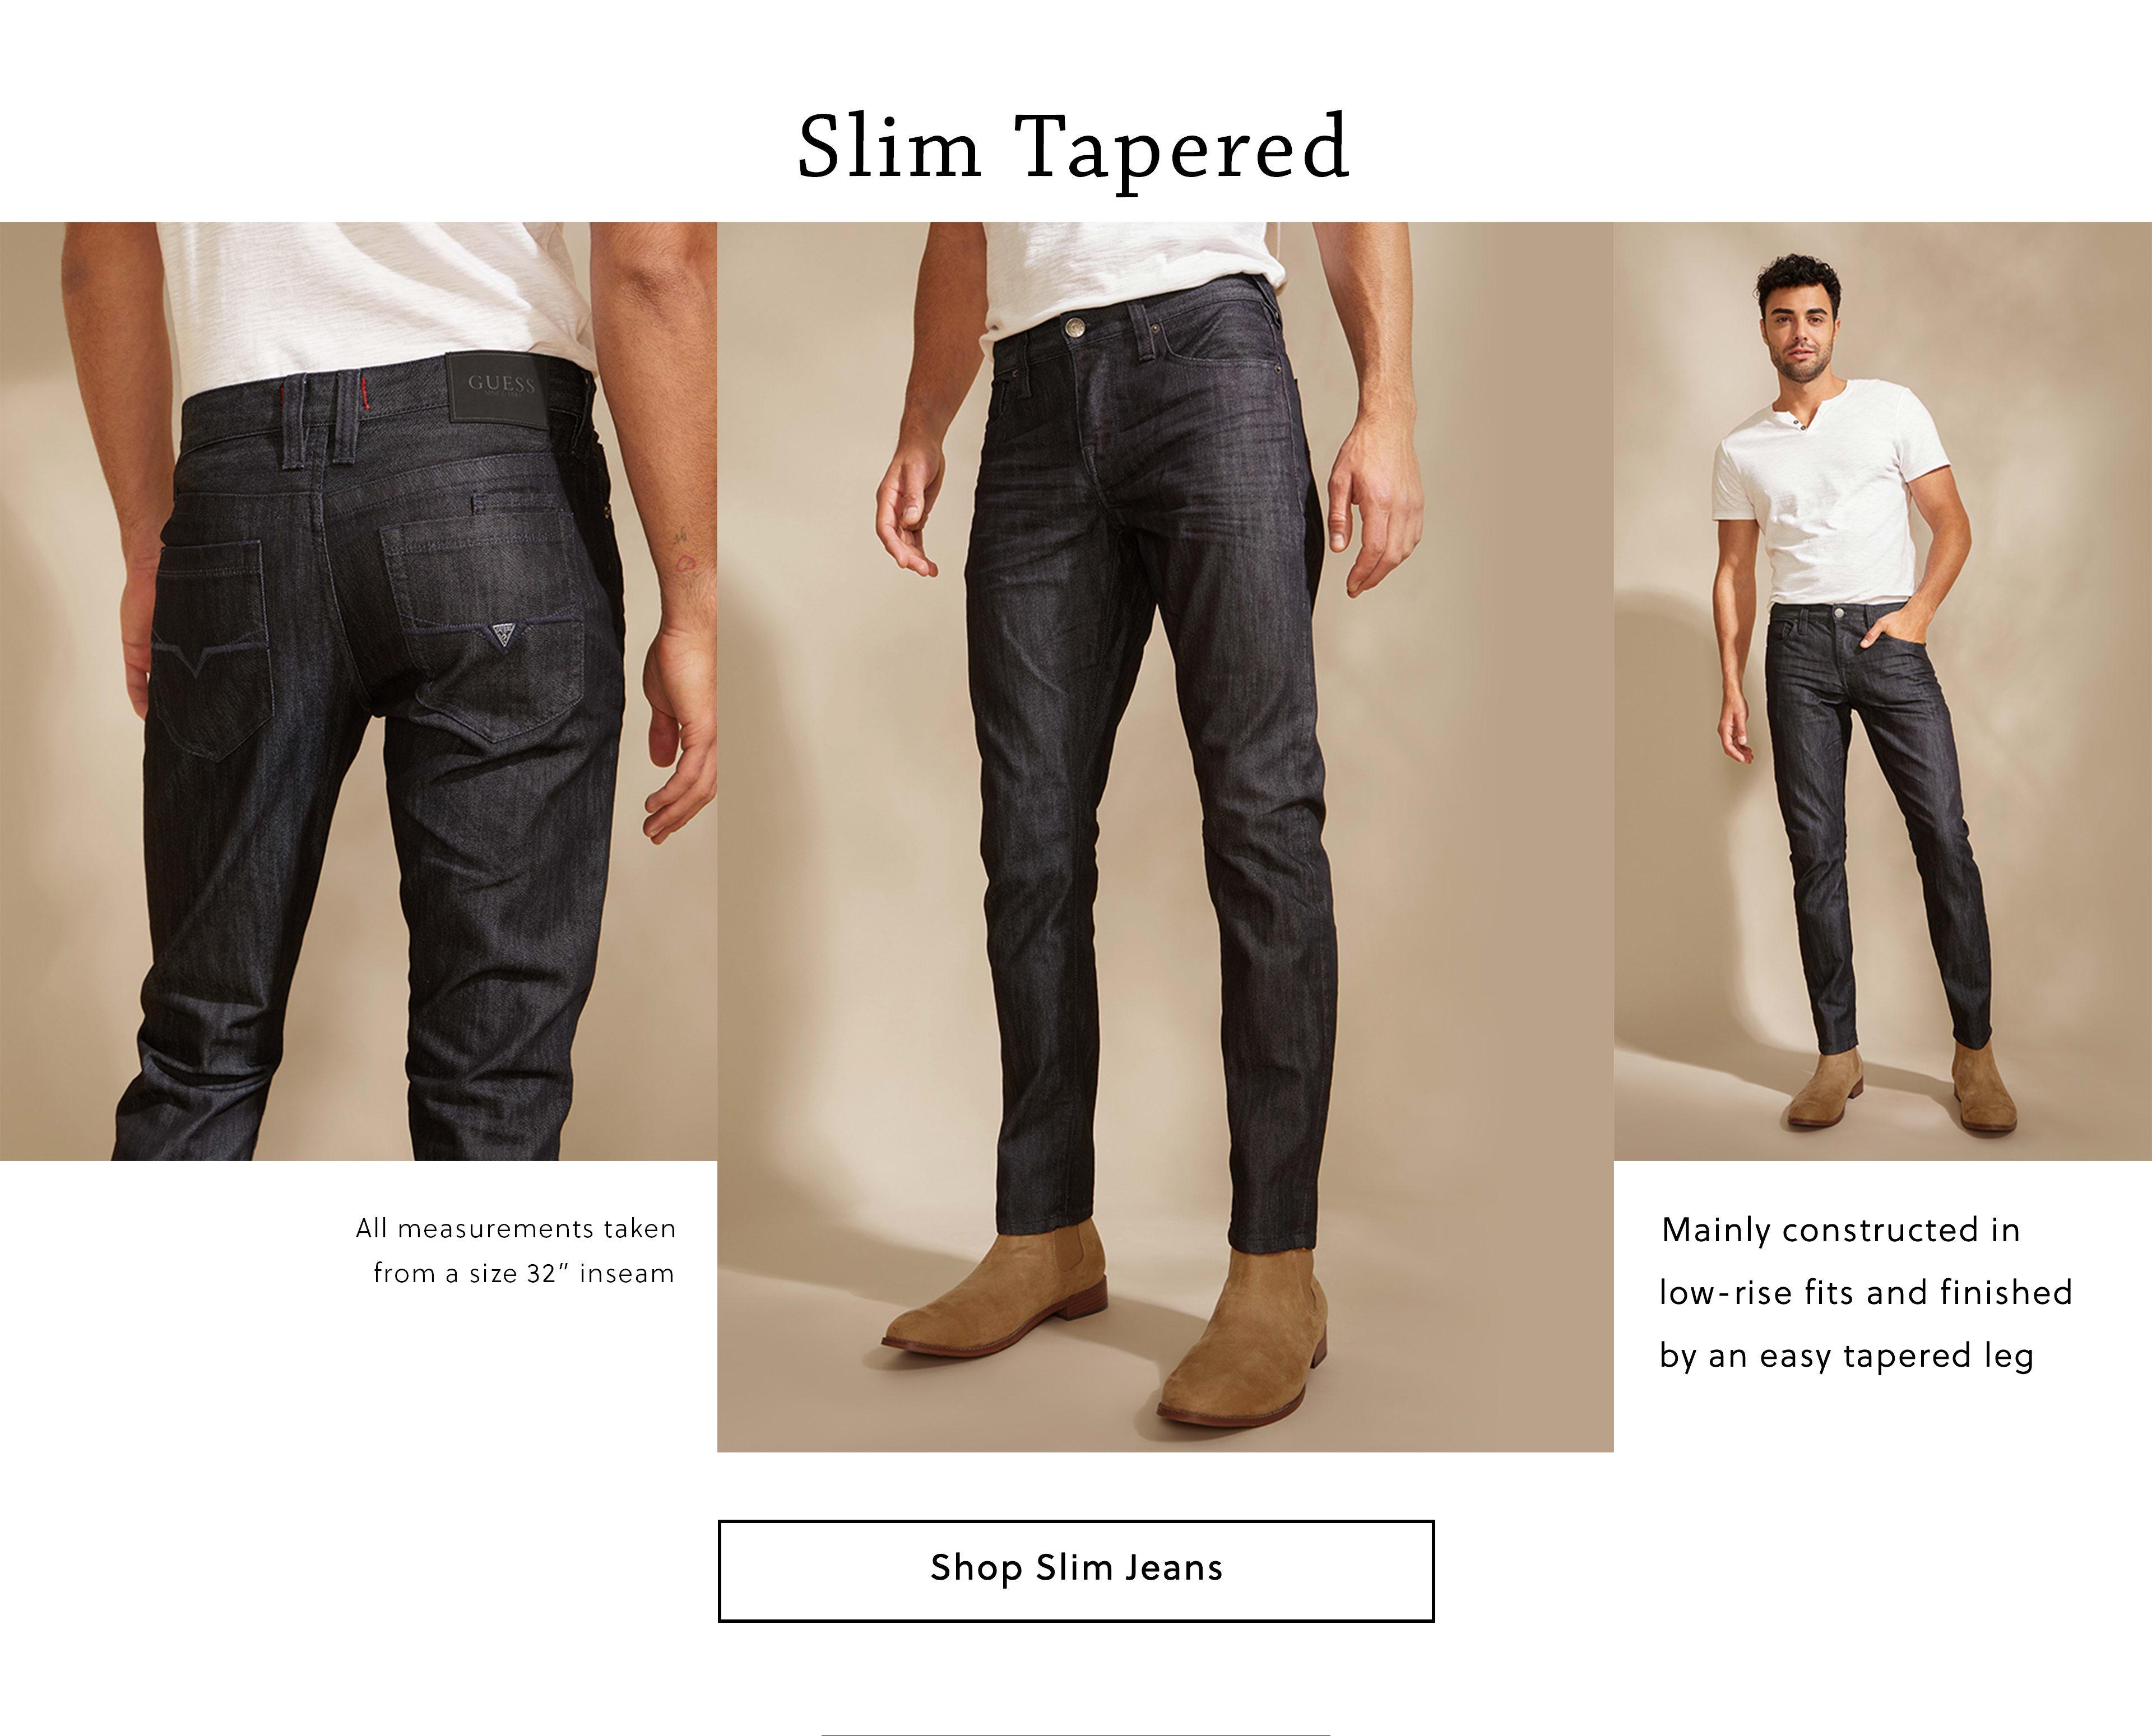 Slim Tapered